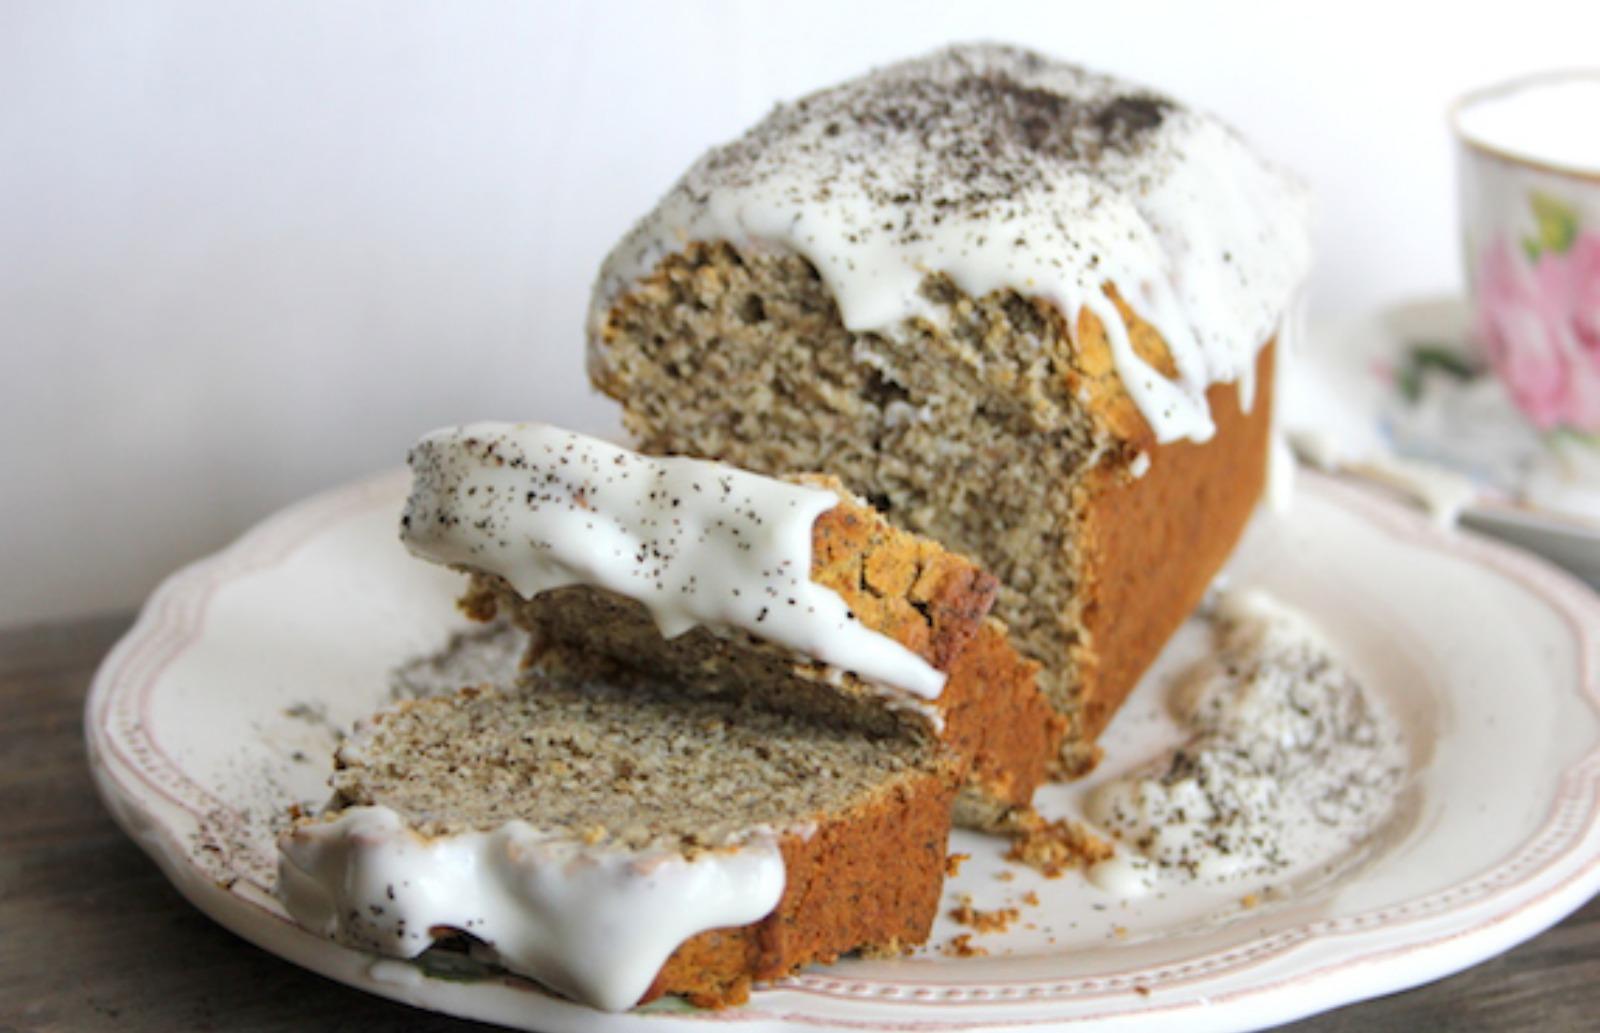 Earl Grey 'Honey' Loaf Cake with Coconut Cream Glaze [Vegan]